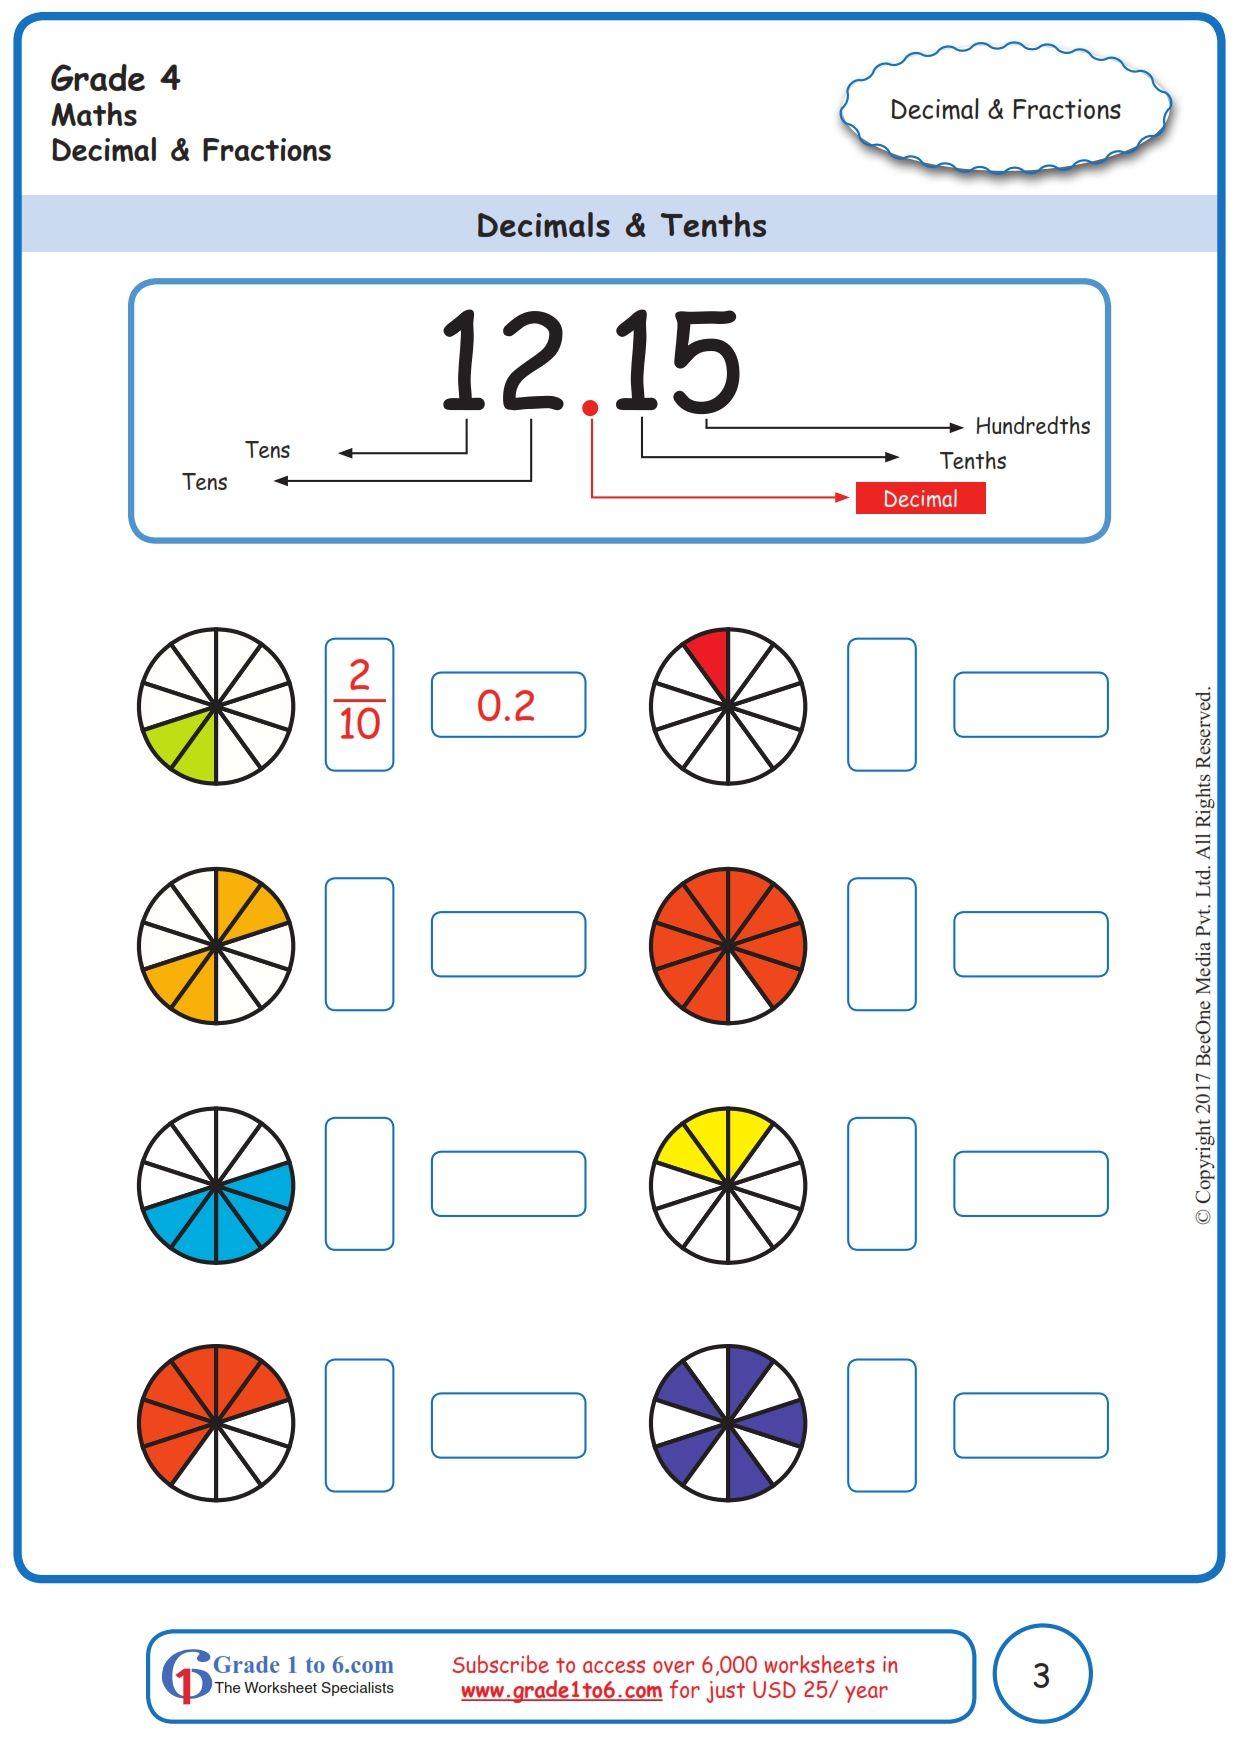 Worksheet Grade 4 Math Decimals Amp Tenths In